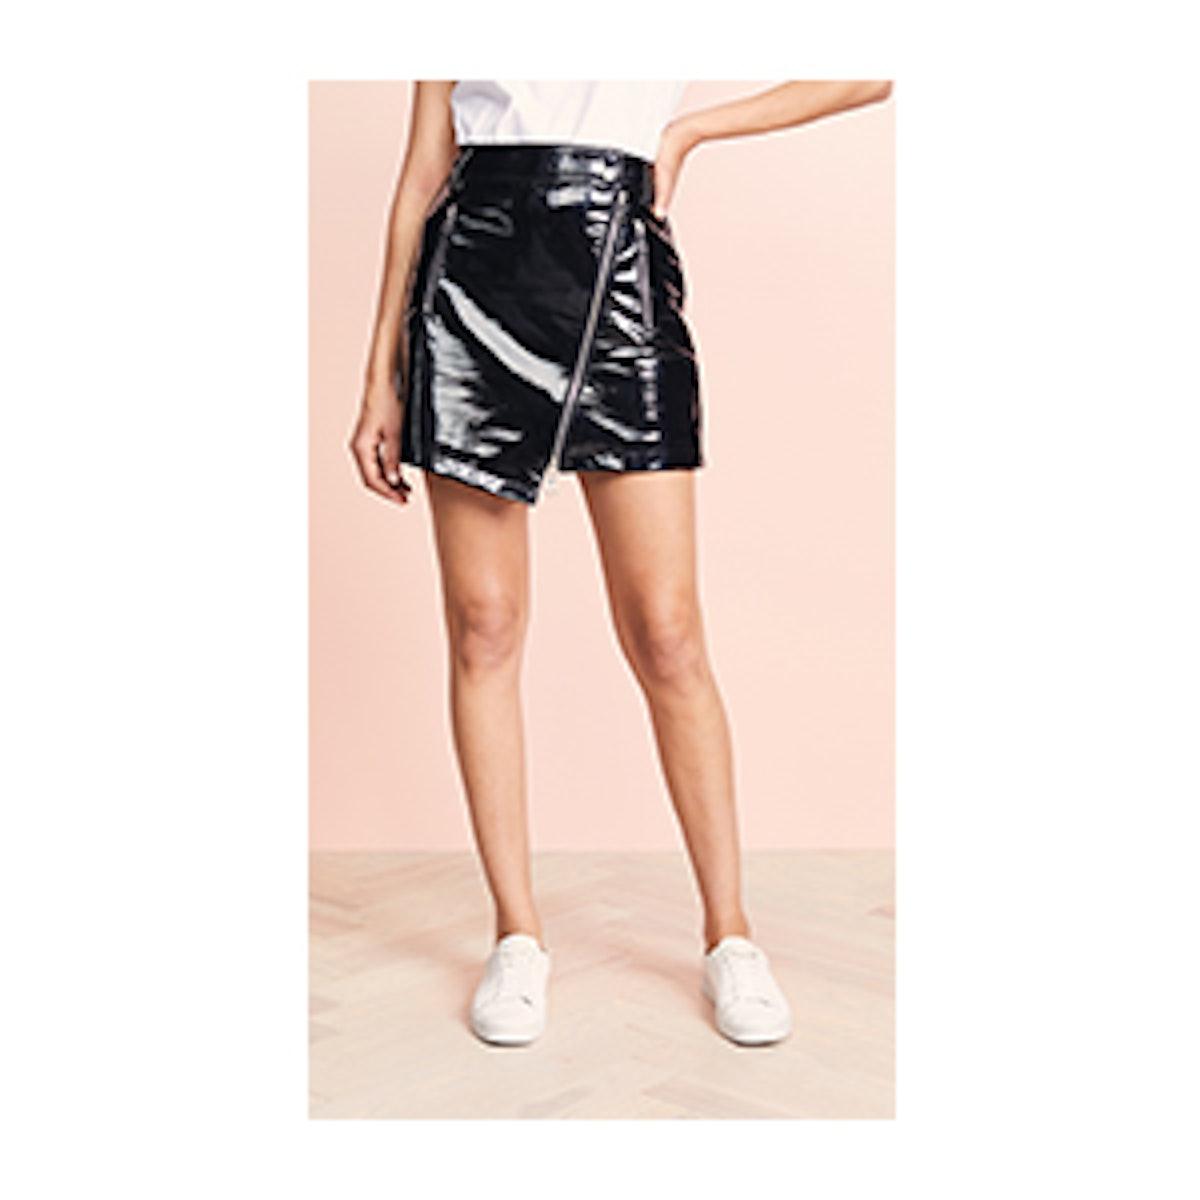 Ei8ht Dreams Asymmetric Zip Front Patent Leather Skirt